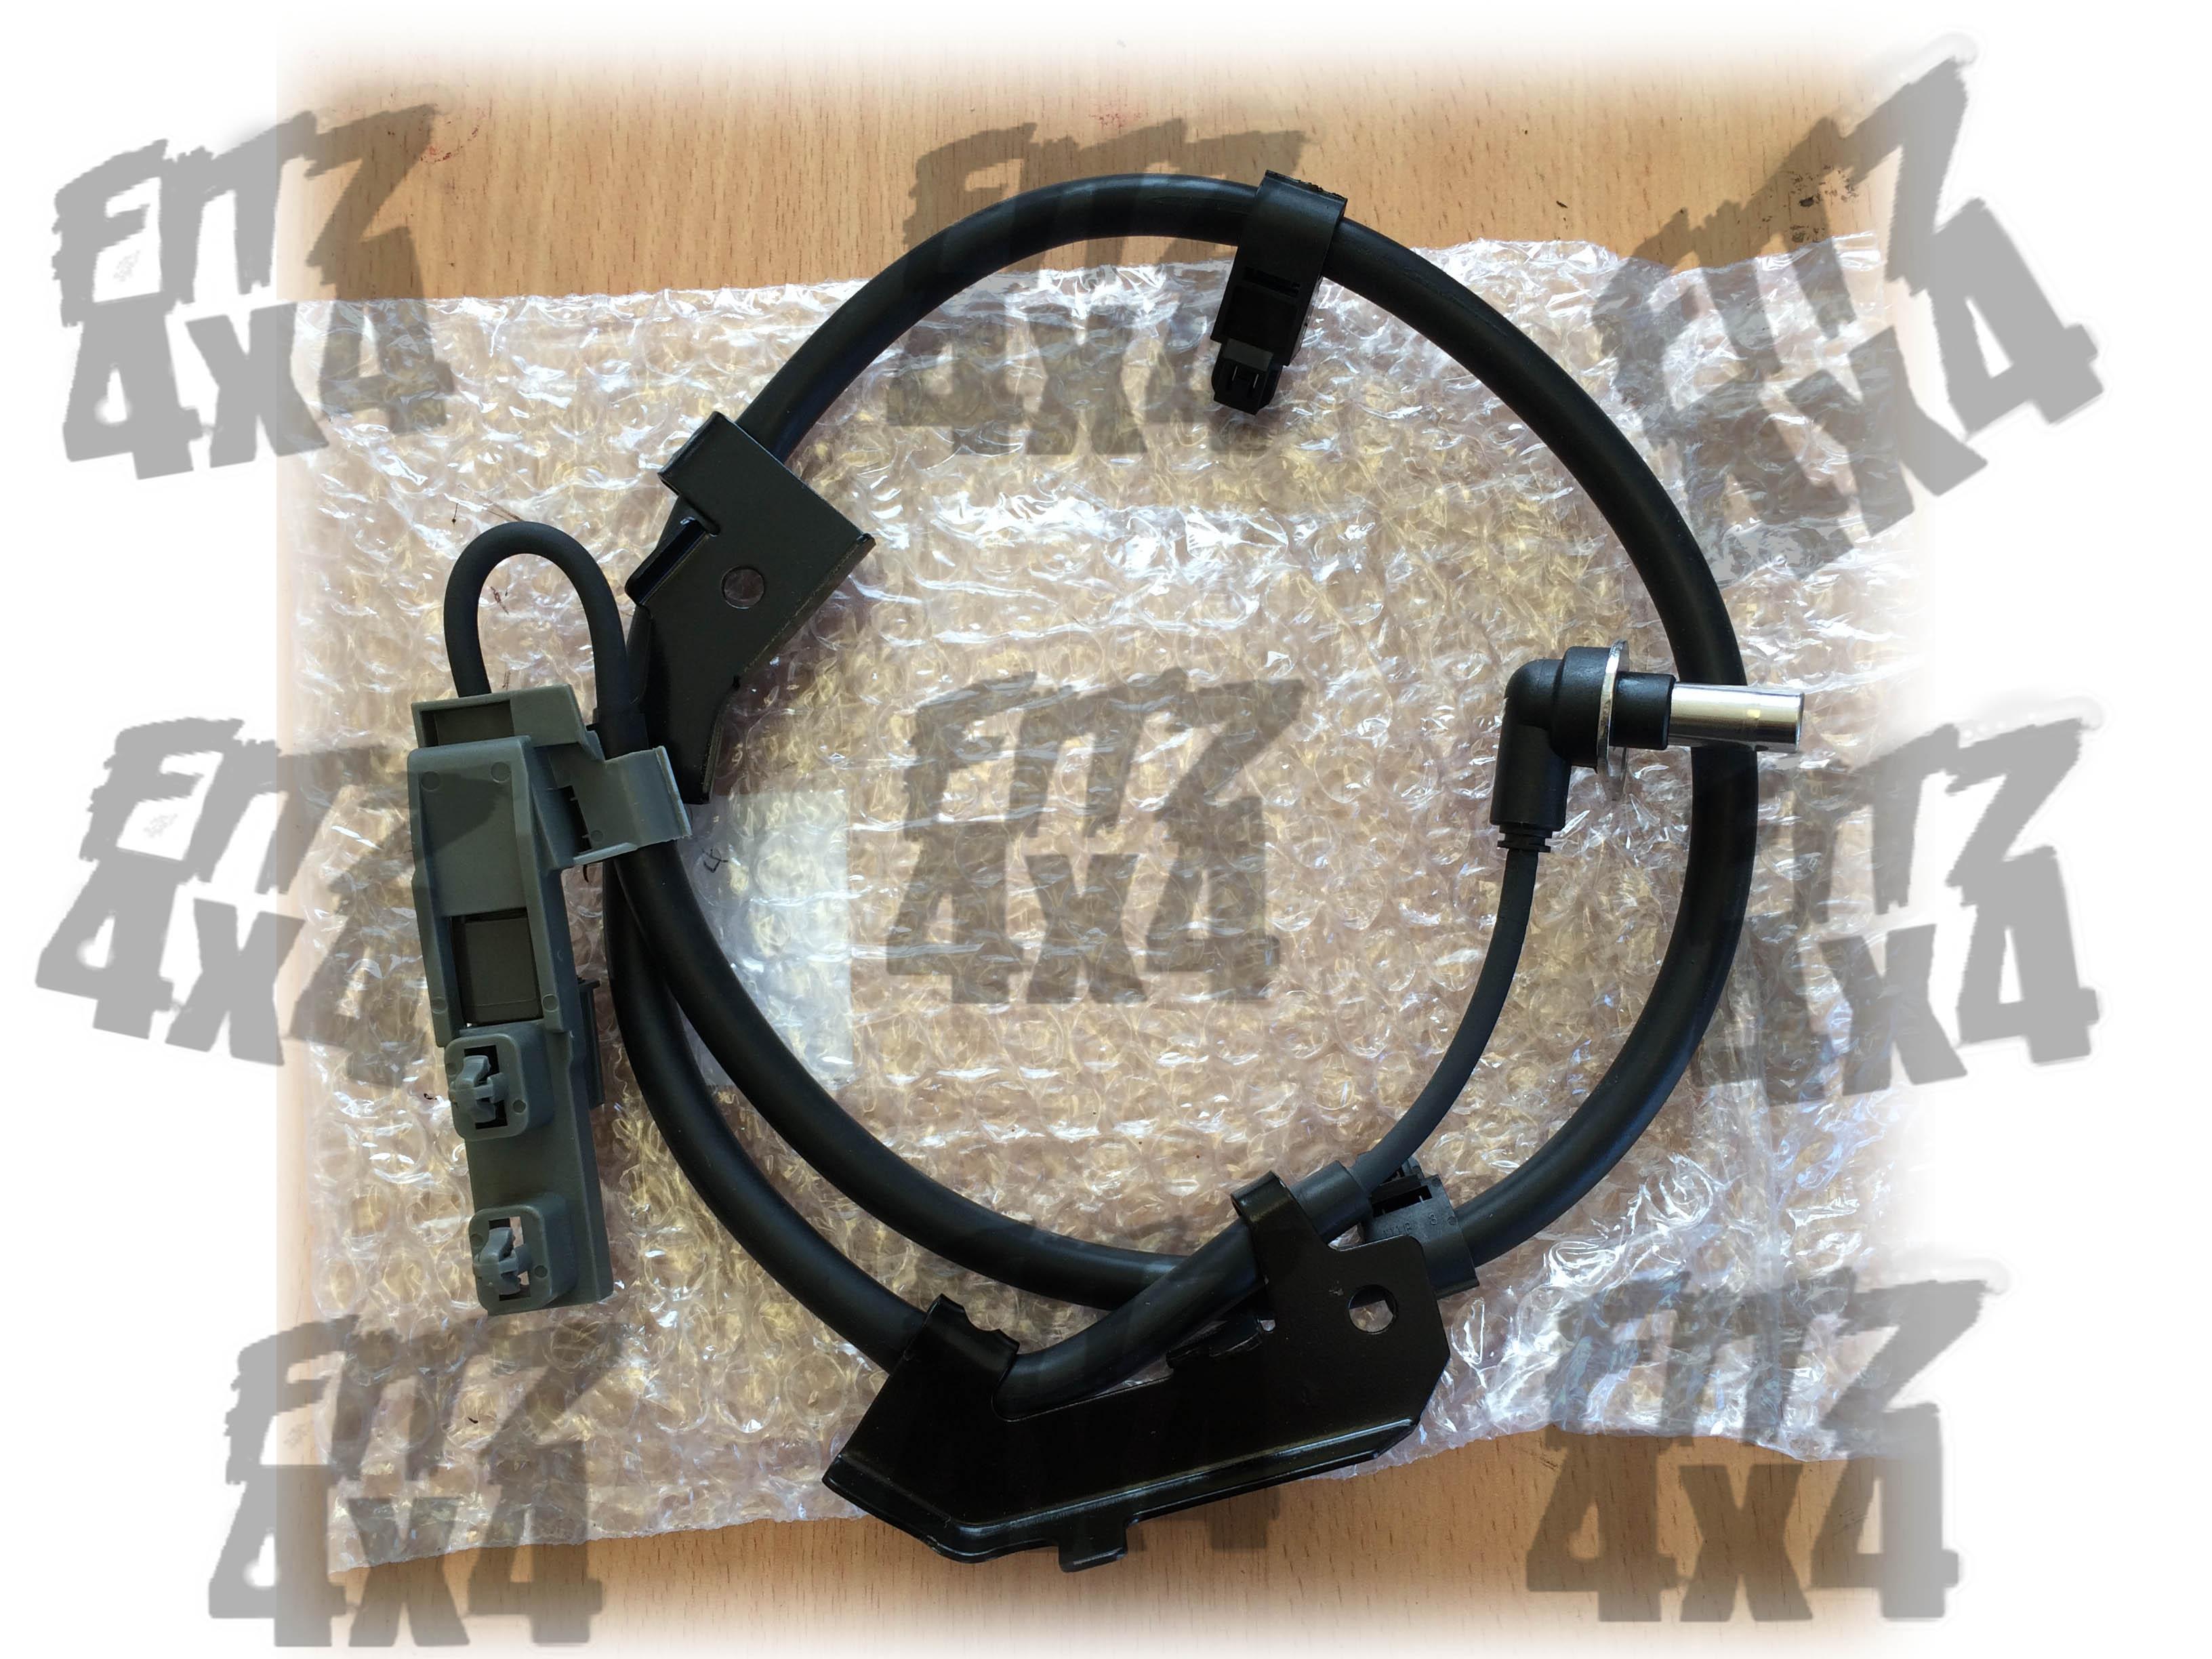 Isuzu D-Max/Rodeo Front ABS Sensor